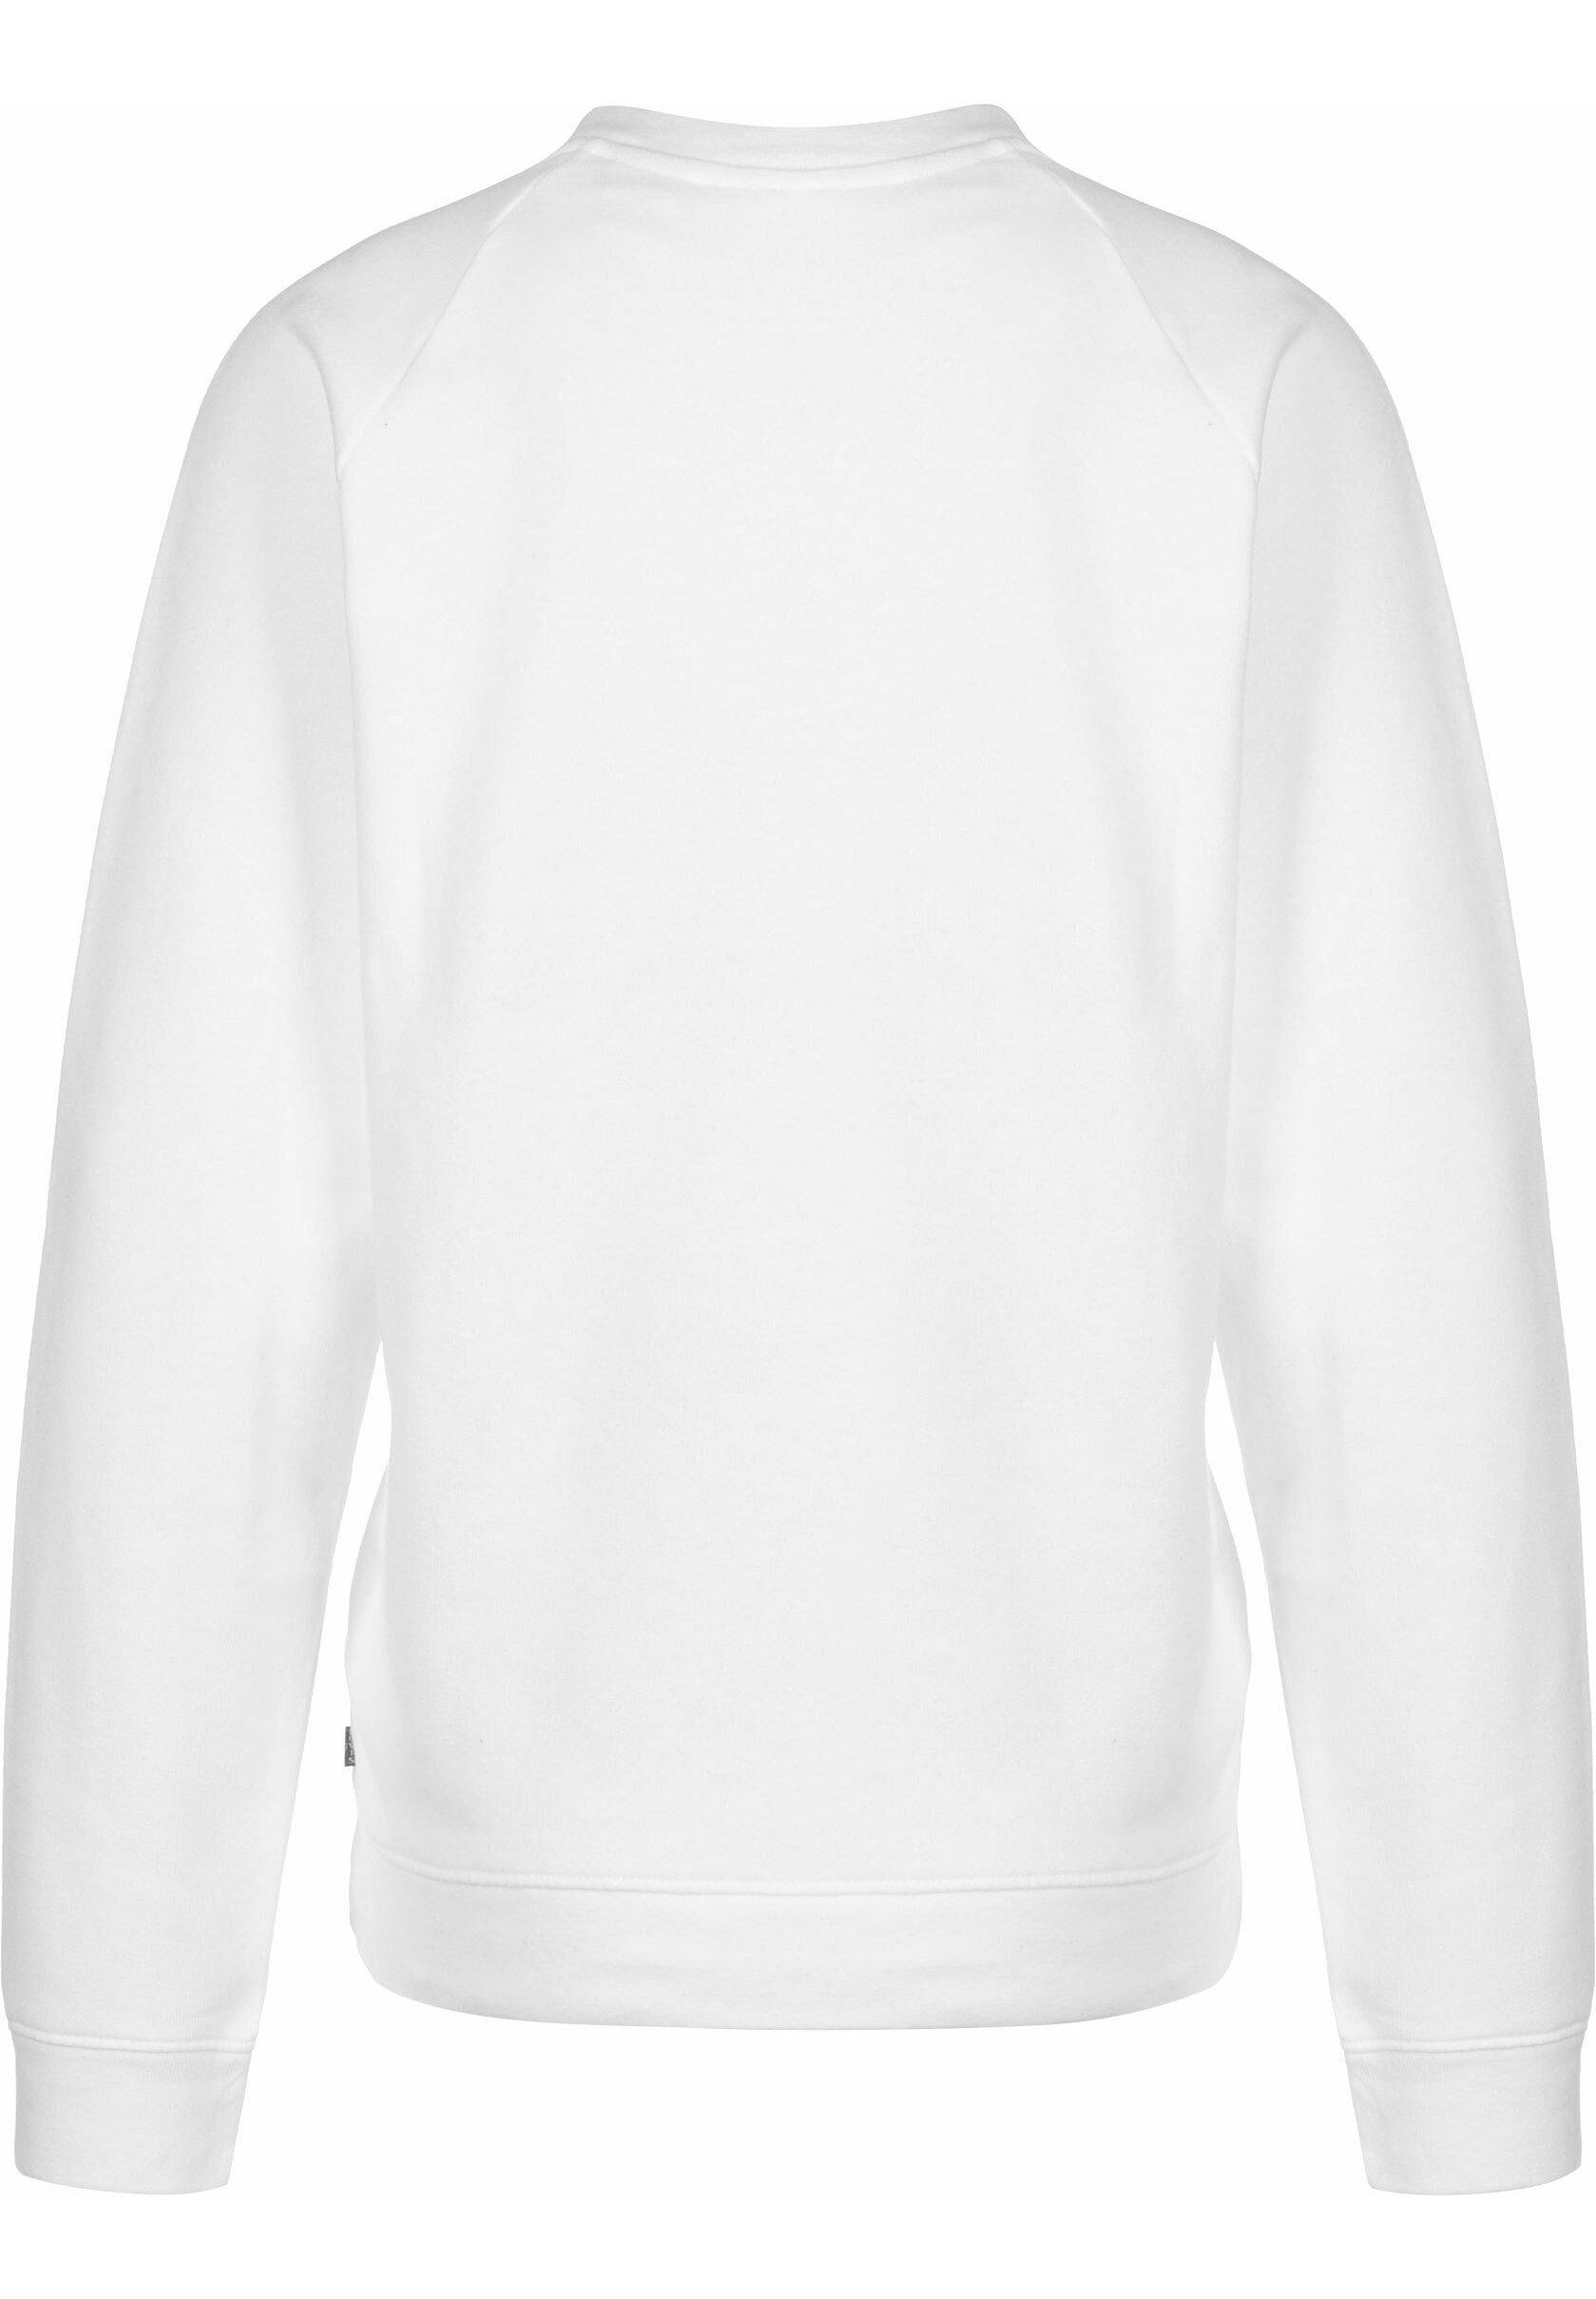 Levi's® Sweatshirt - Logo White/hvit